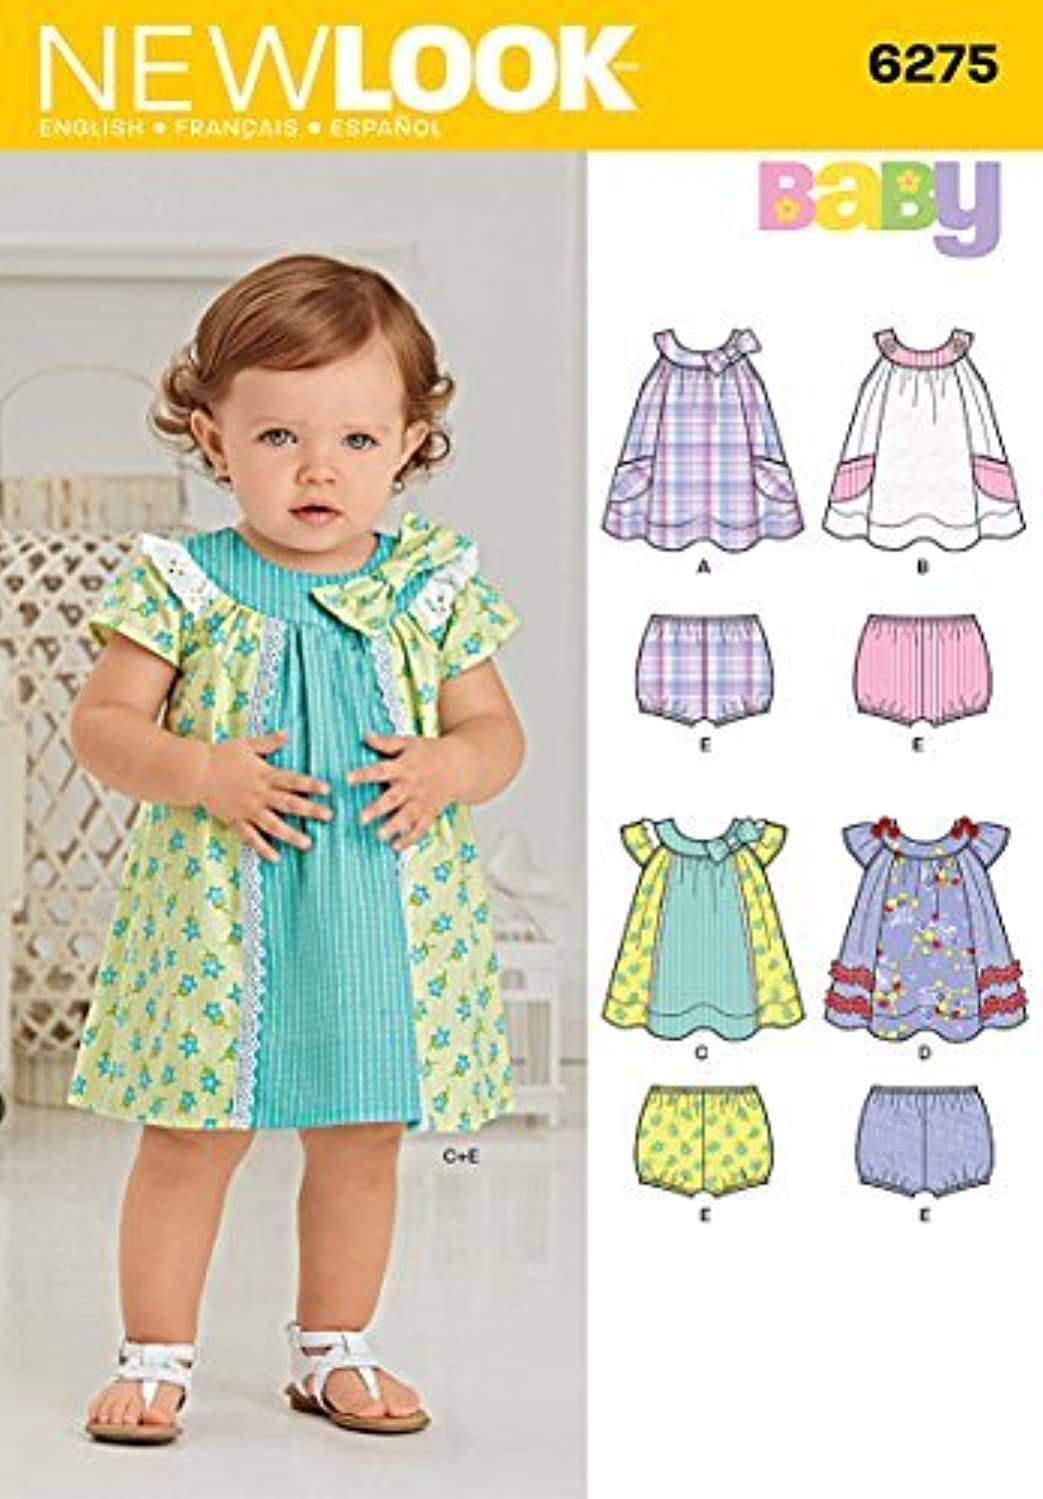 Simplicity Creative Patterns New Look 6275 Babies' Dress and Panties, A (NB-Small-Medium-Large)